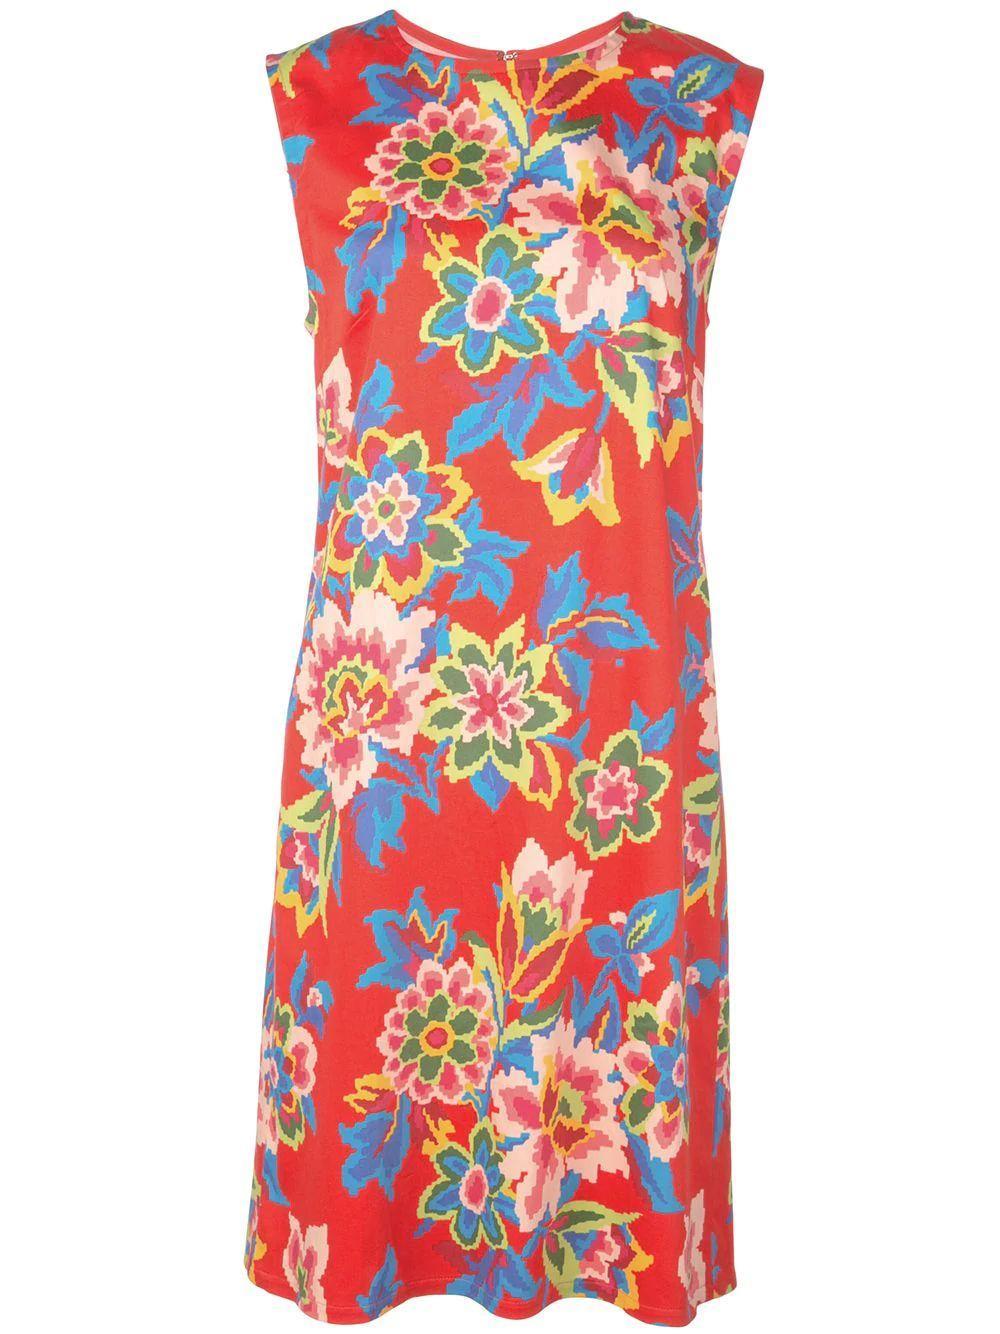 Sleeve Less Pixel Floral Print Shift Dress